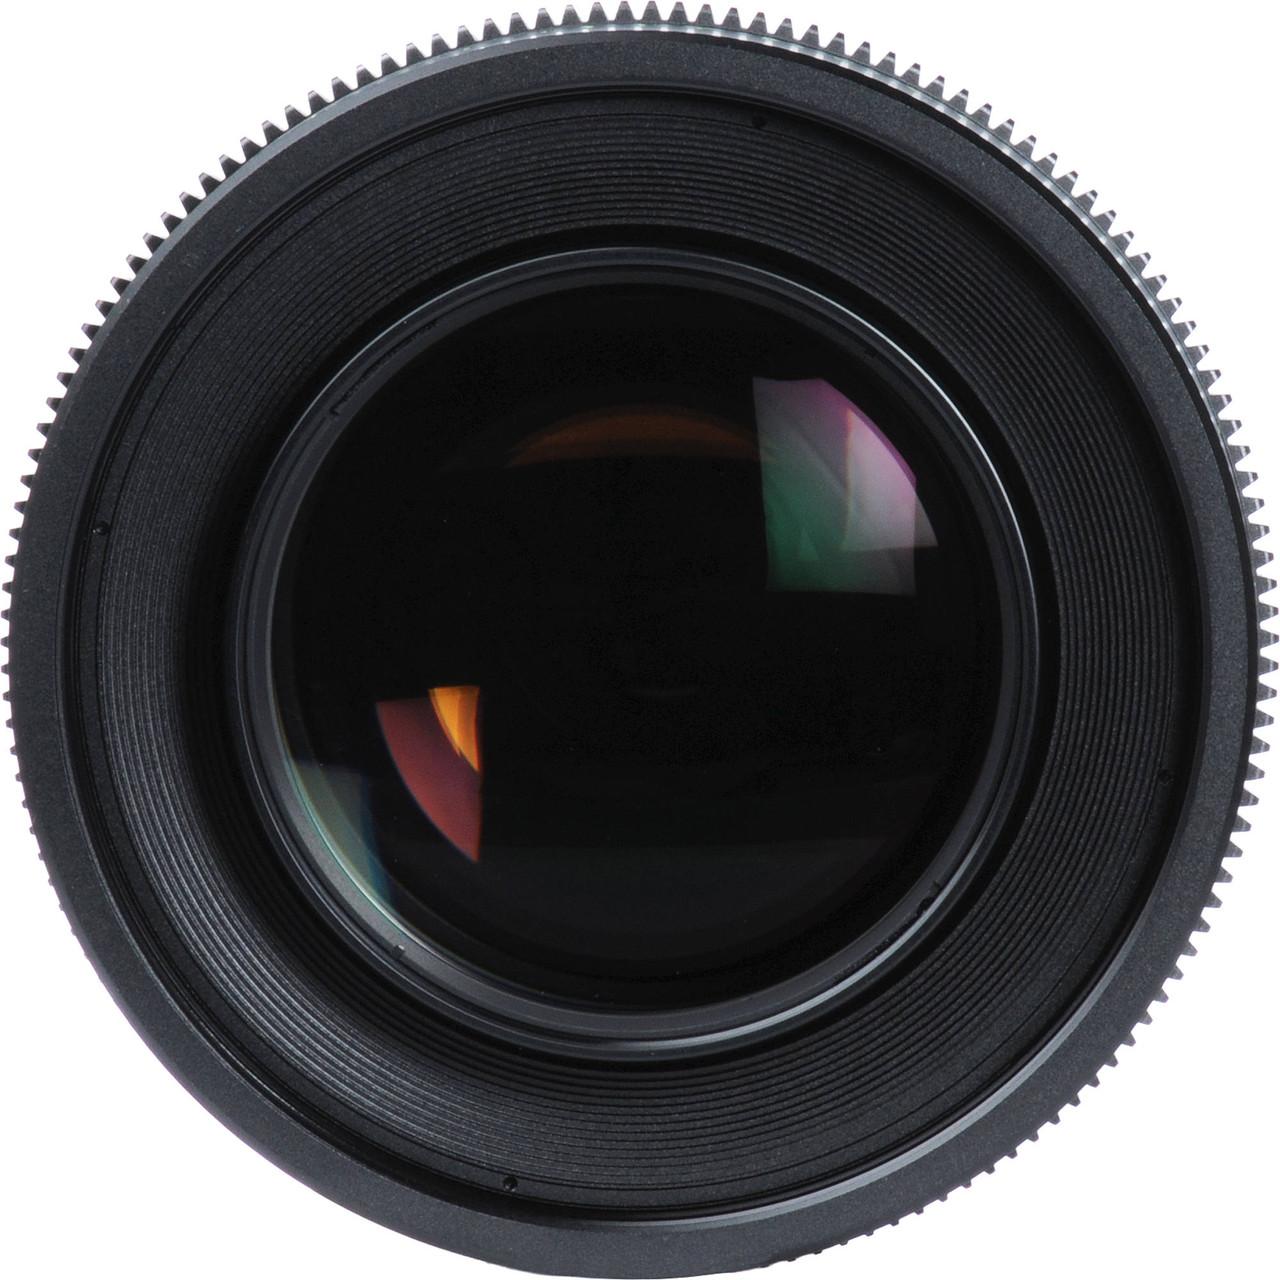 Canon Cn E 85mm T1 3 L F Cine Lens 6571b001